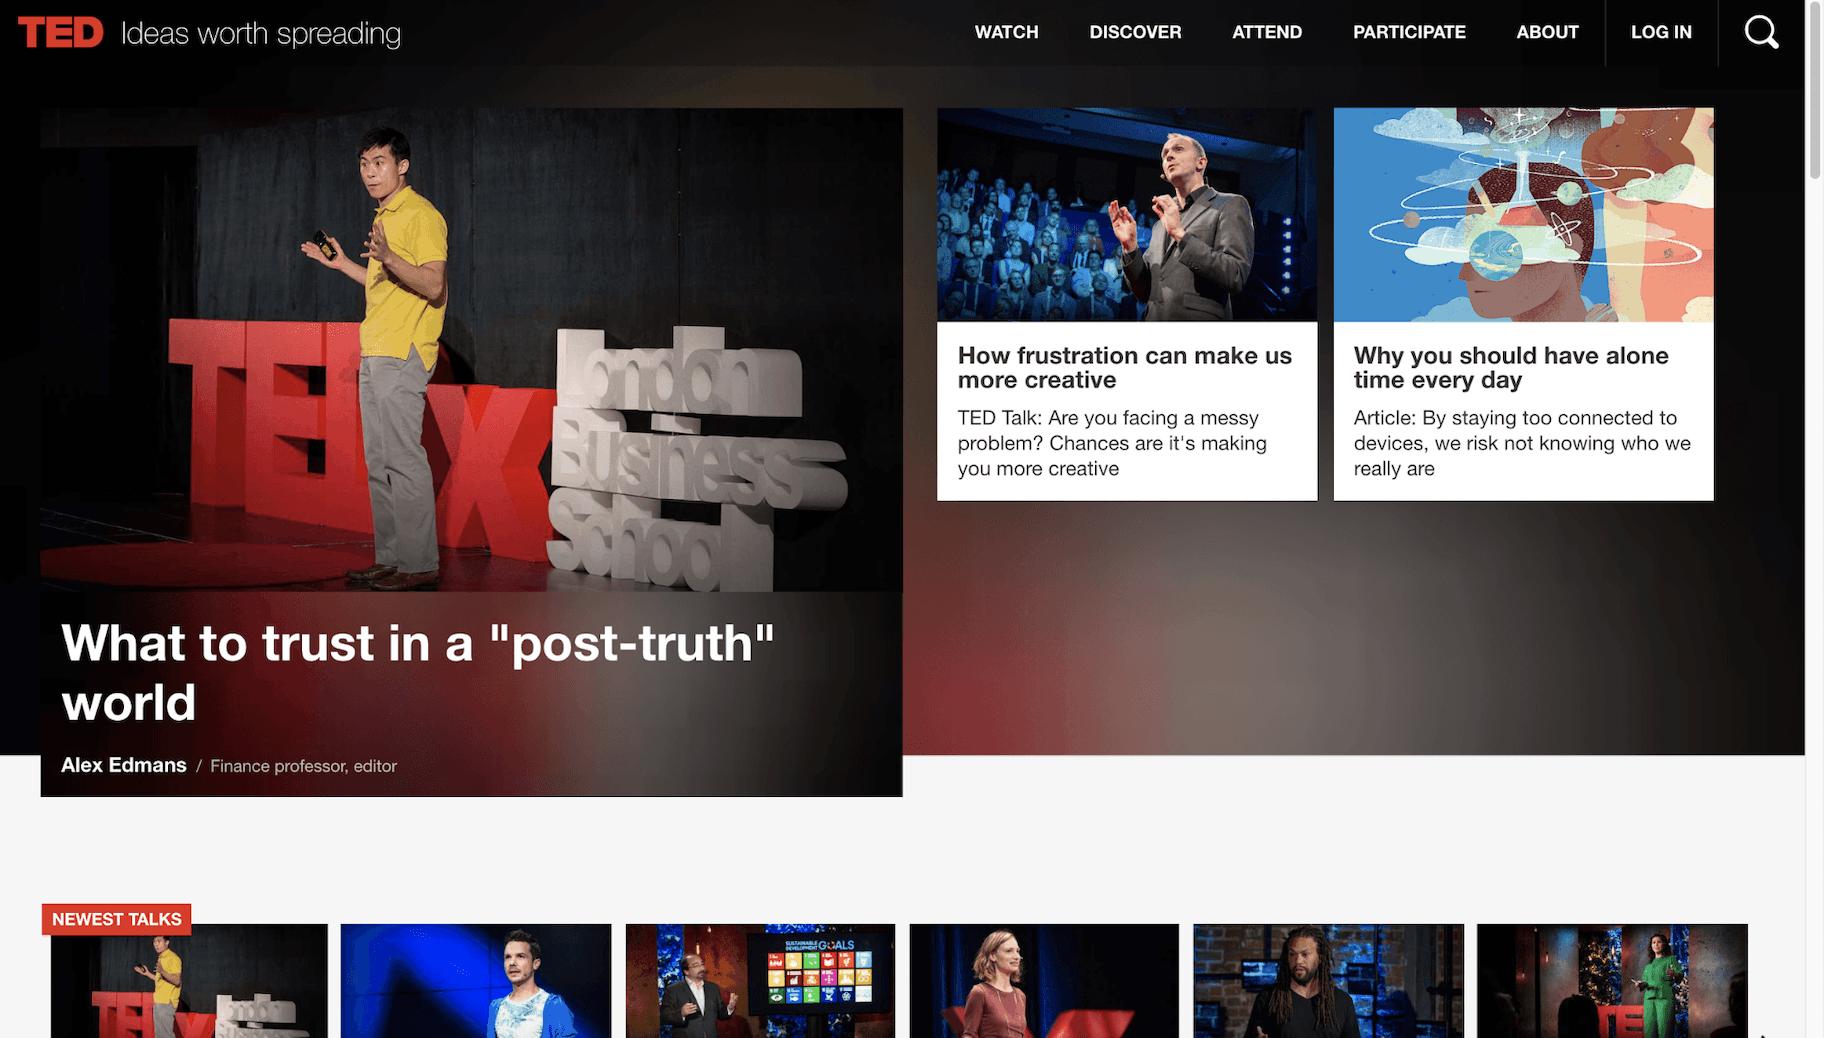 Ted Talks Vision Statement